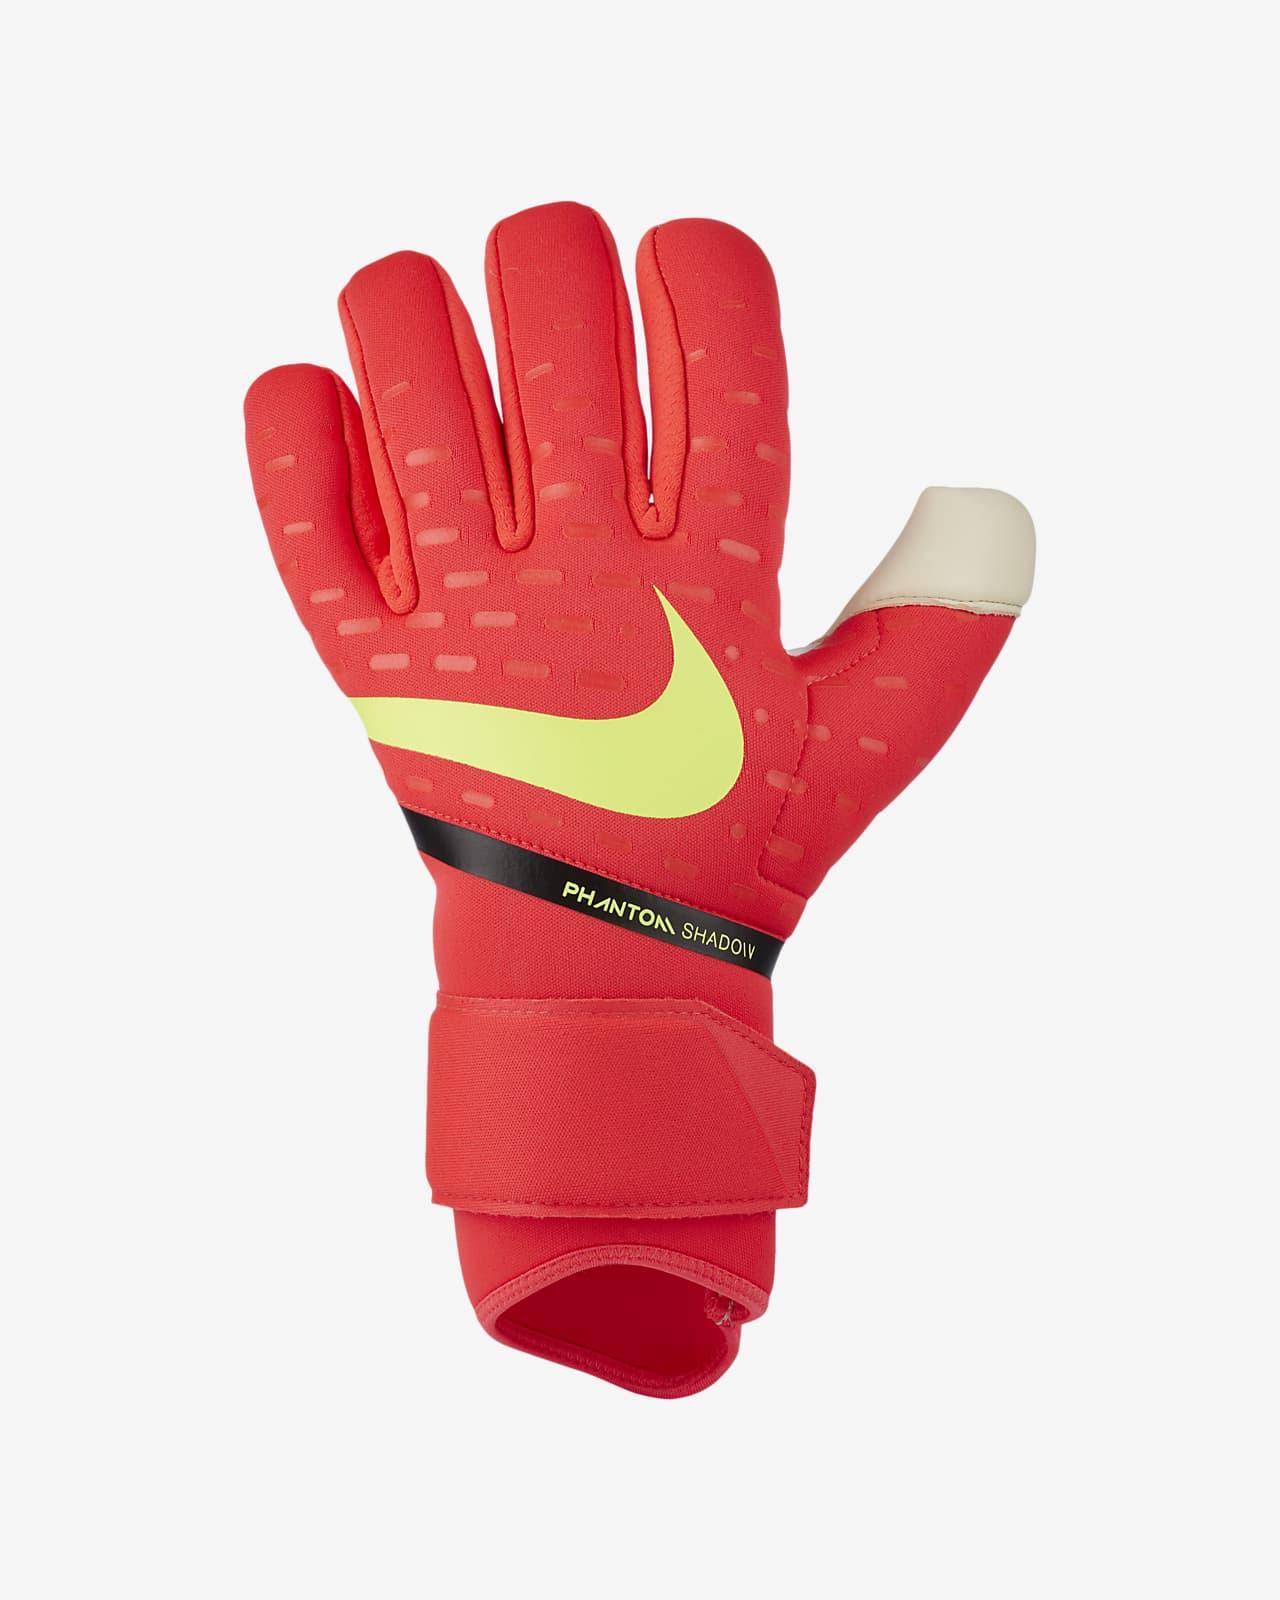 Gants de football Nike Goalkeeper Phantom Shadow